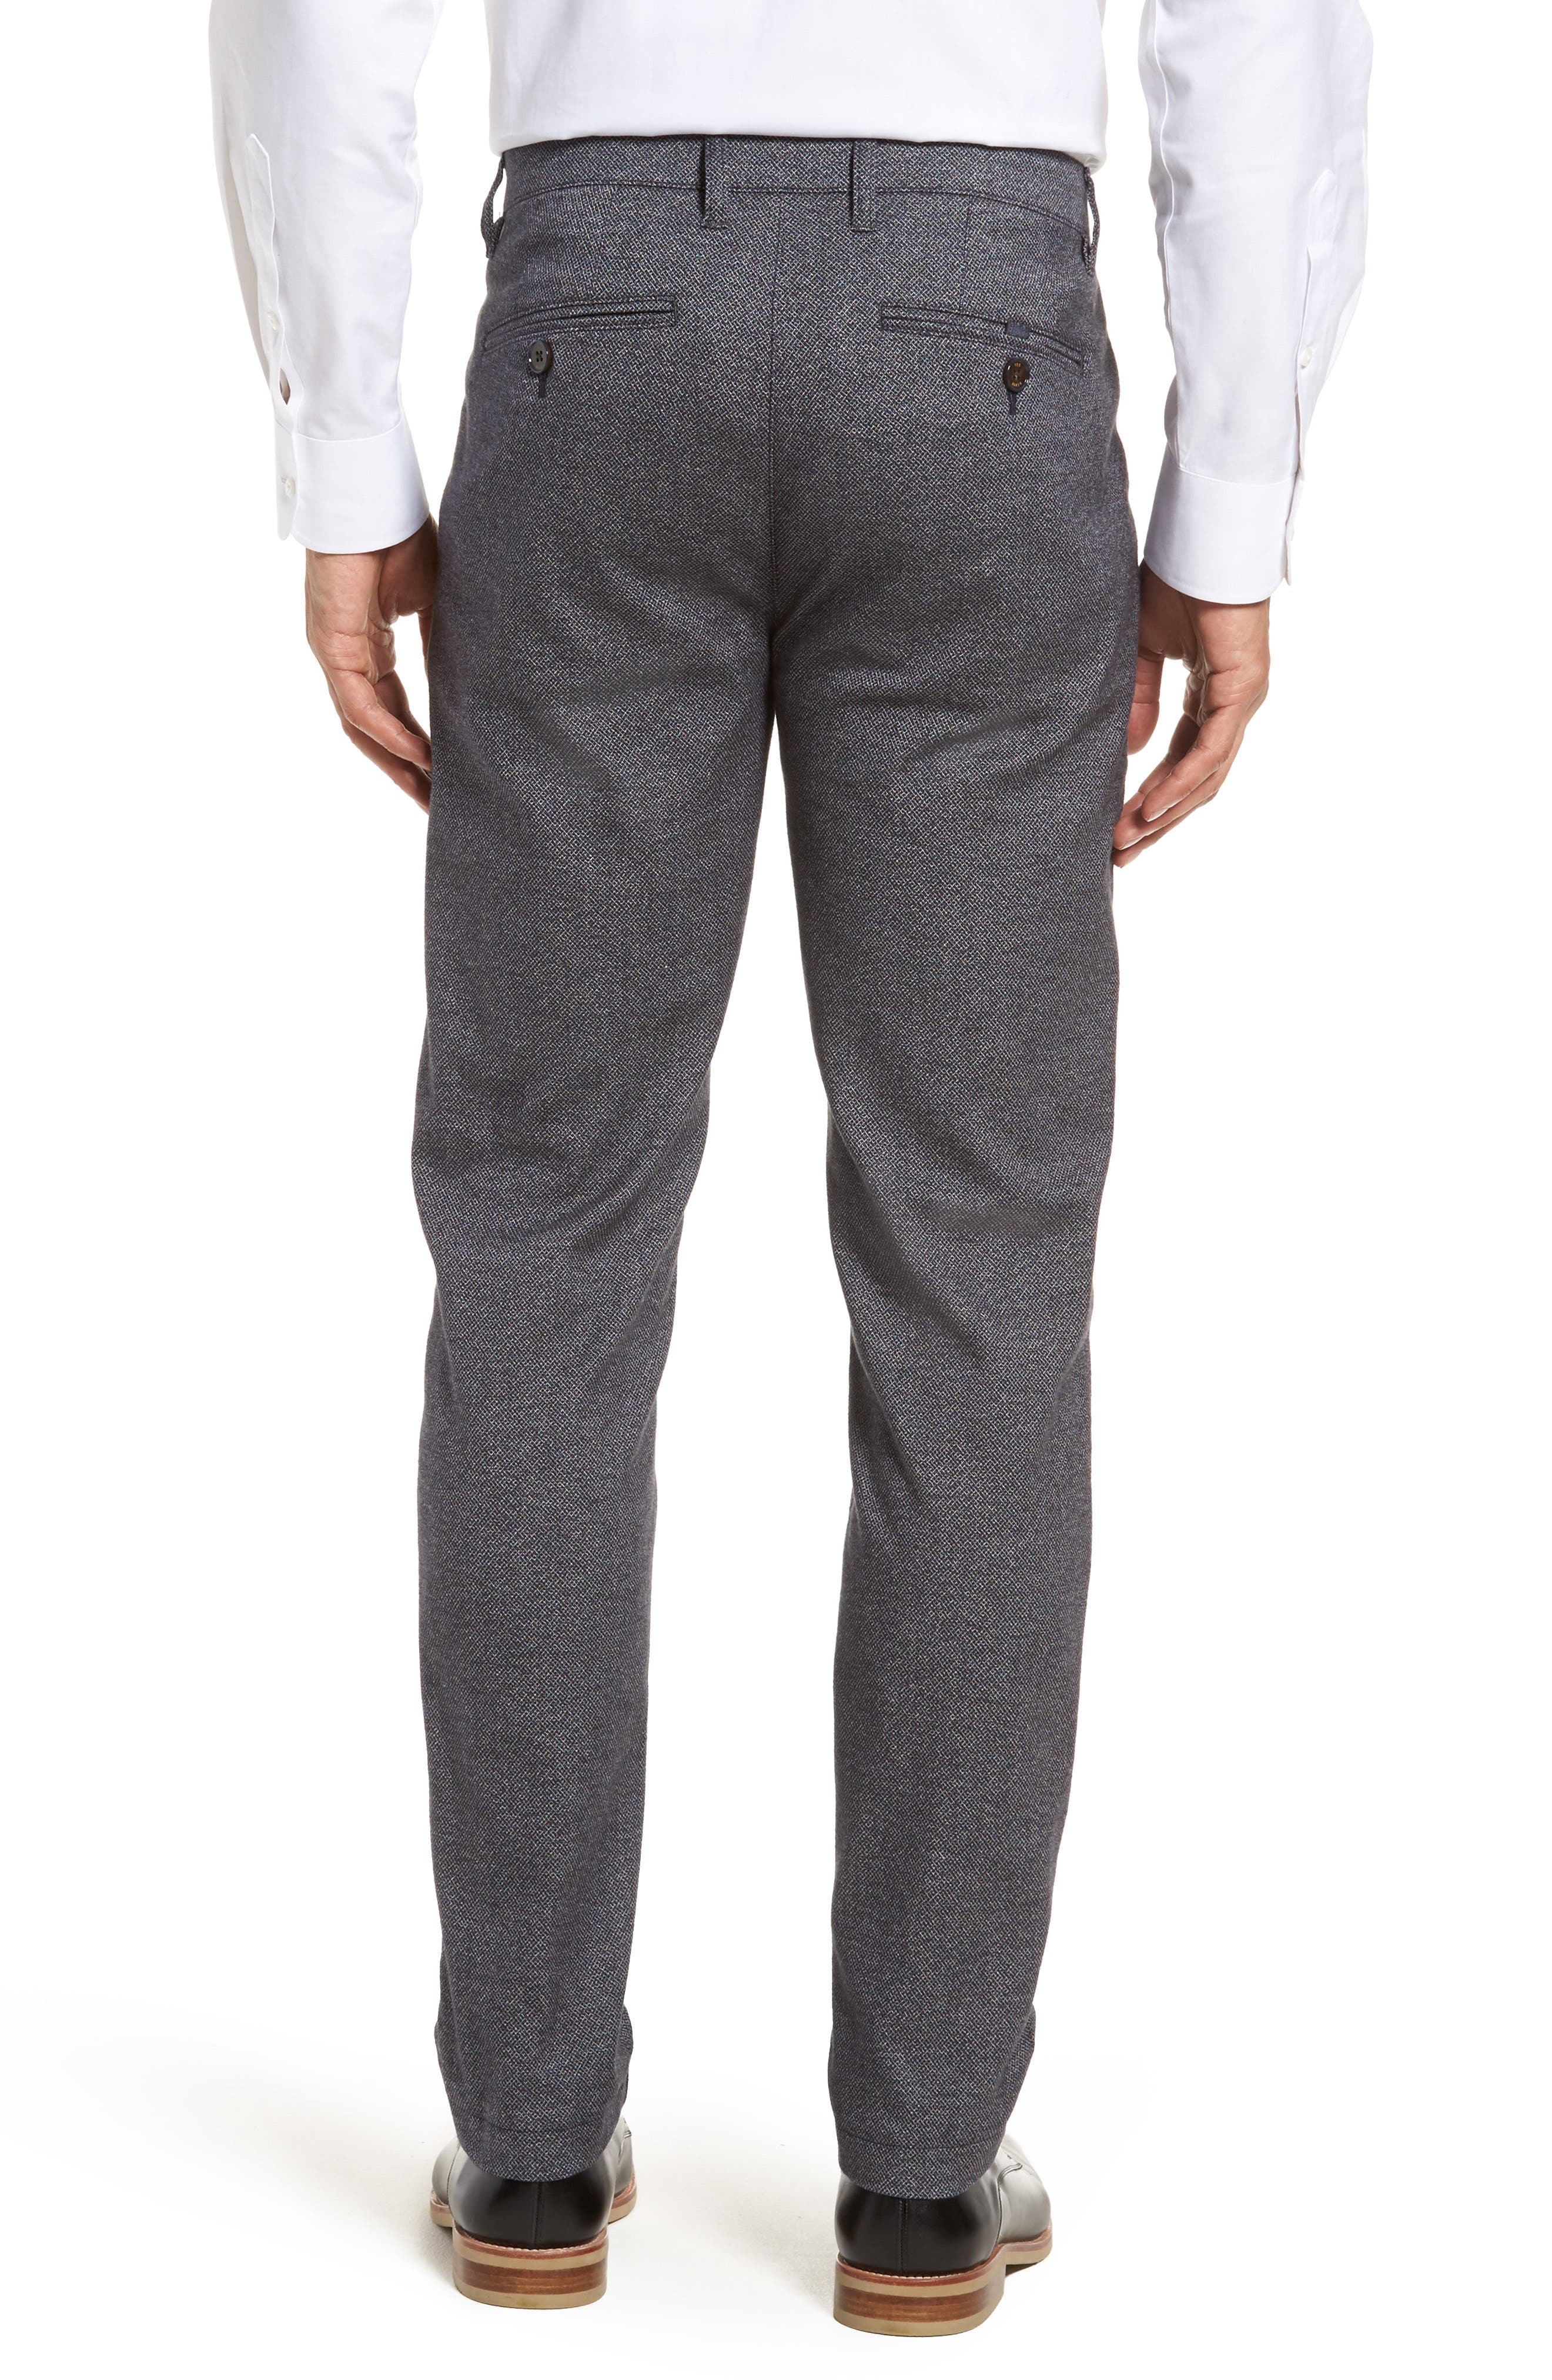 Pintz Slim Fit Trousers,                             Alternate thumbnail 2, color,                             Navy